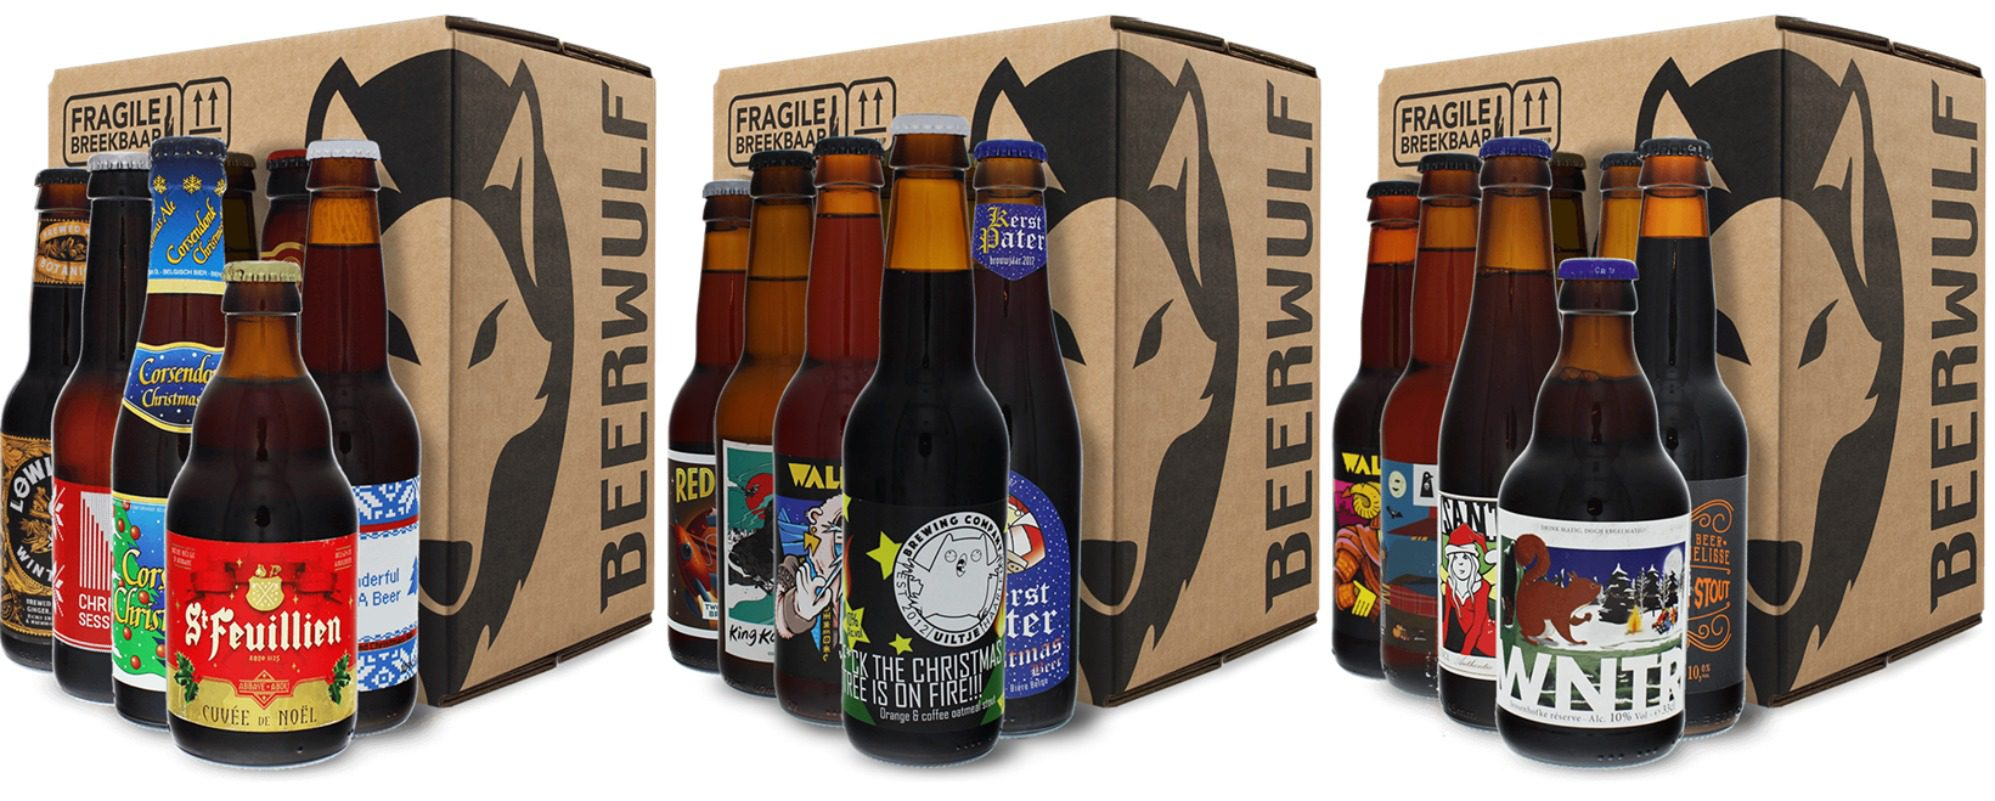 Last minute cadeau ideetjes - Beerwulf bier